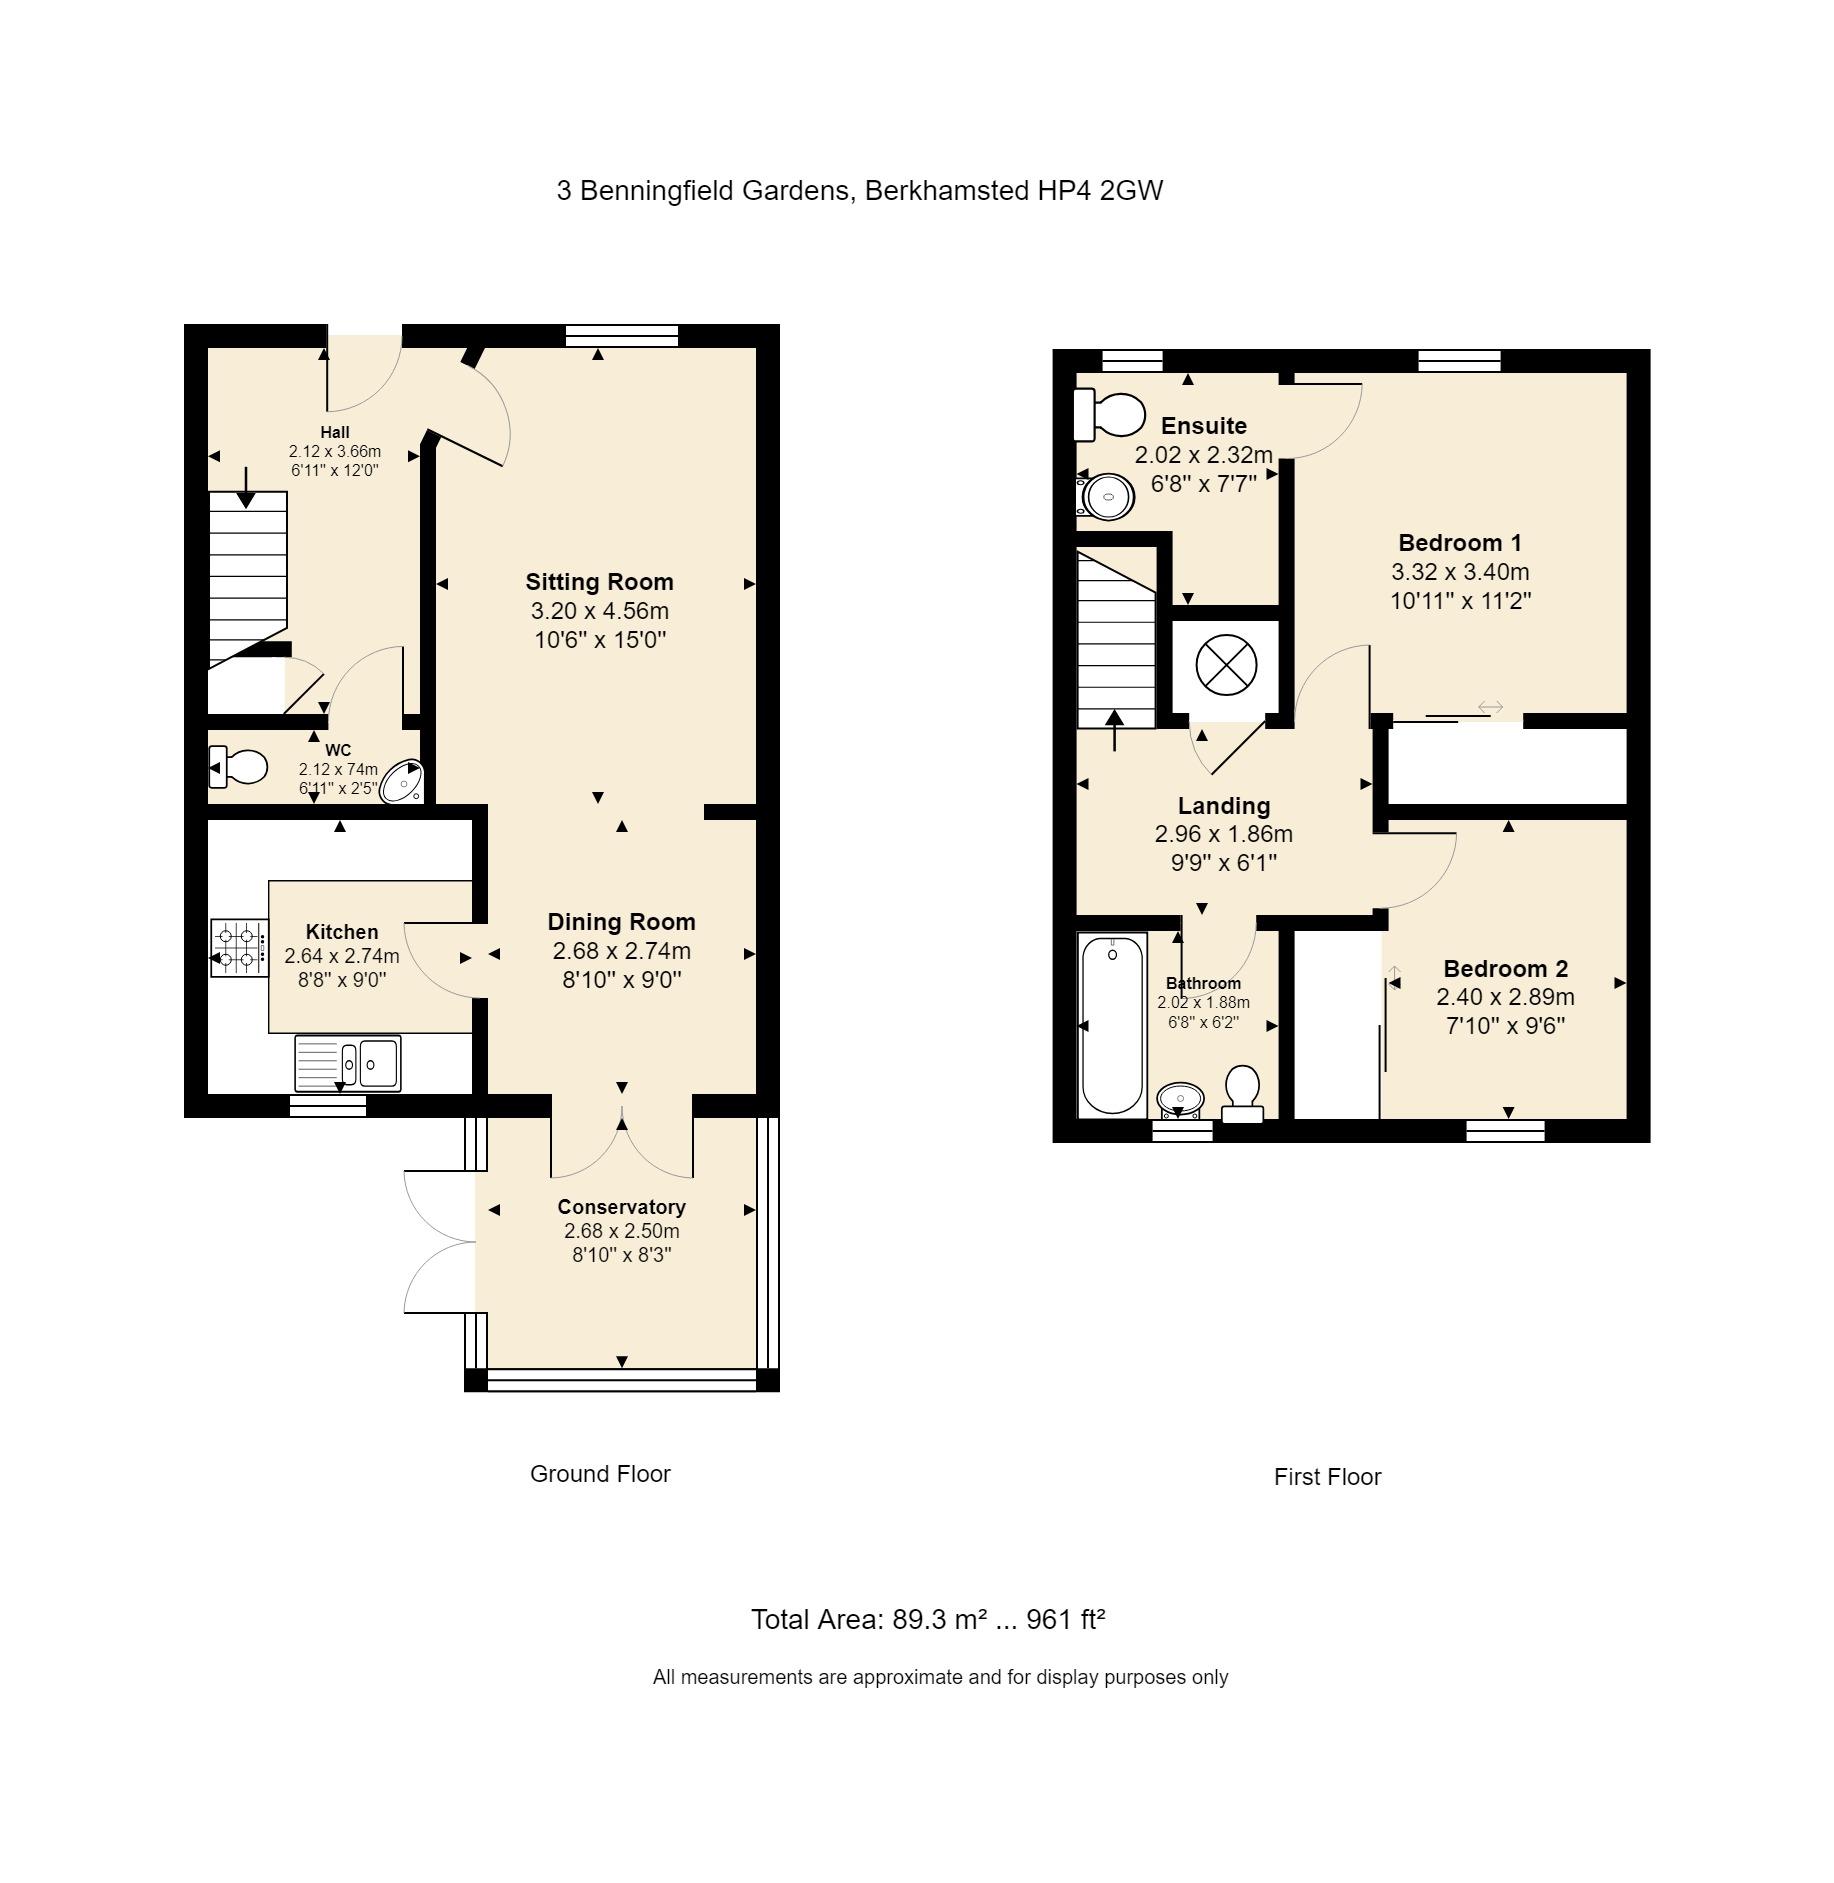 3 Benningfield Gardens Floorplan